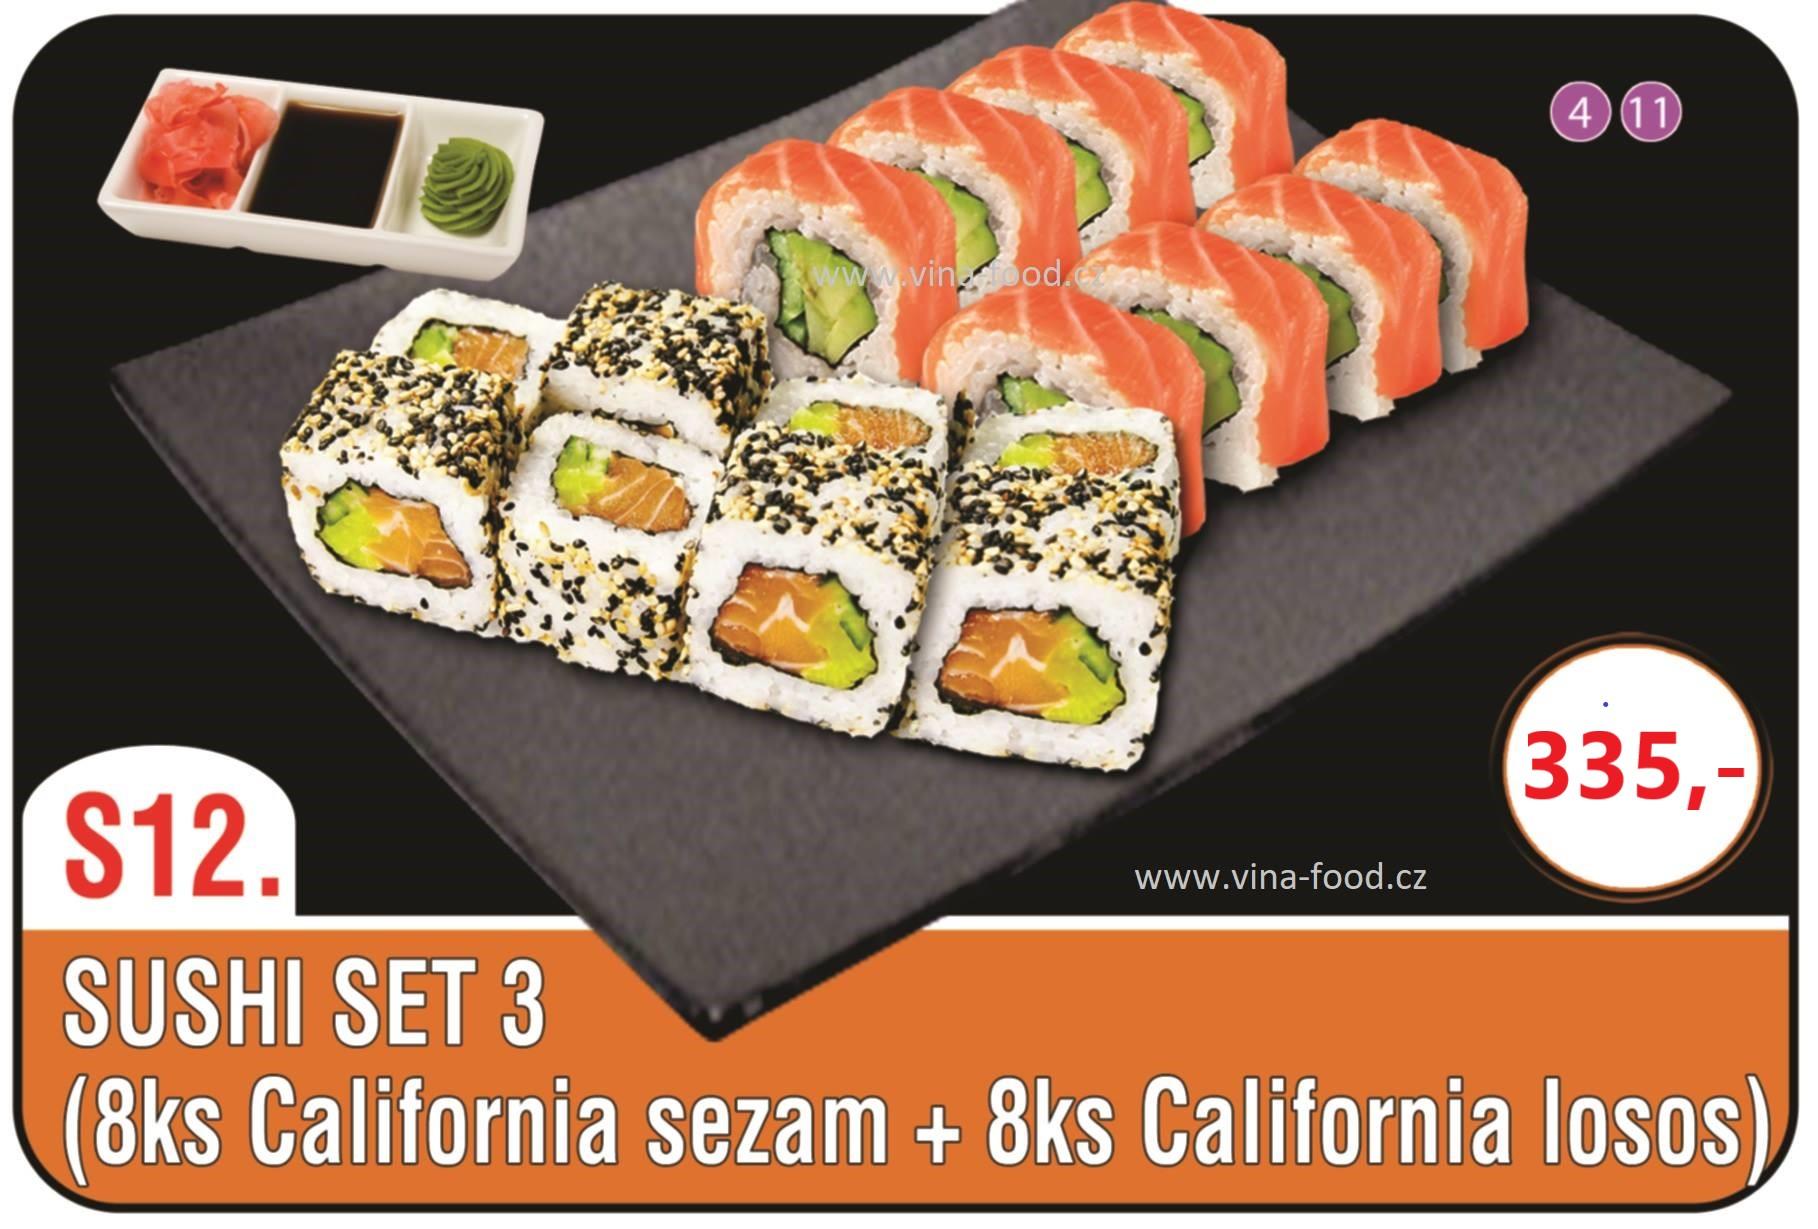 Sushi set 3 (8ks california sezam + 8ks california losos)